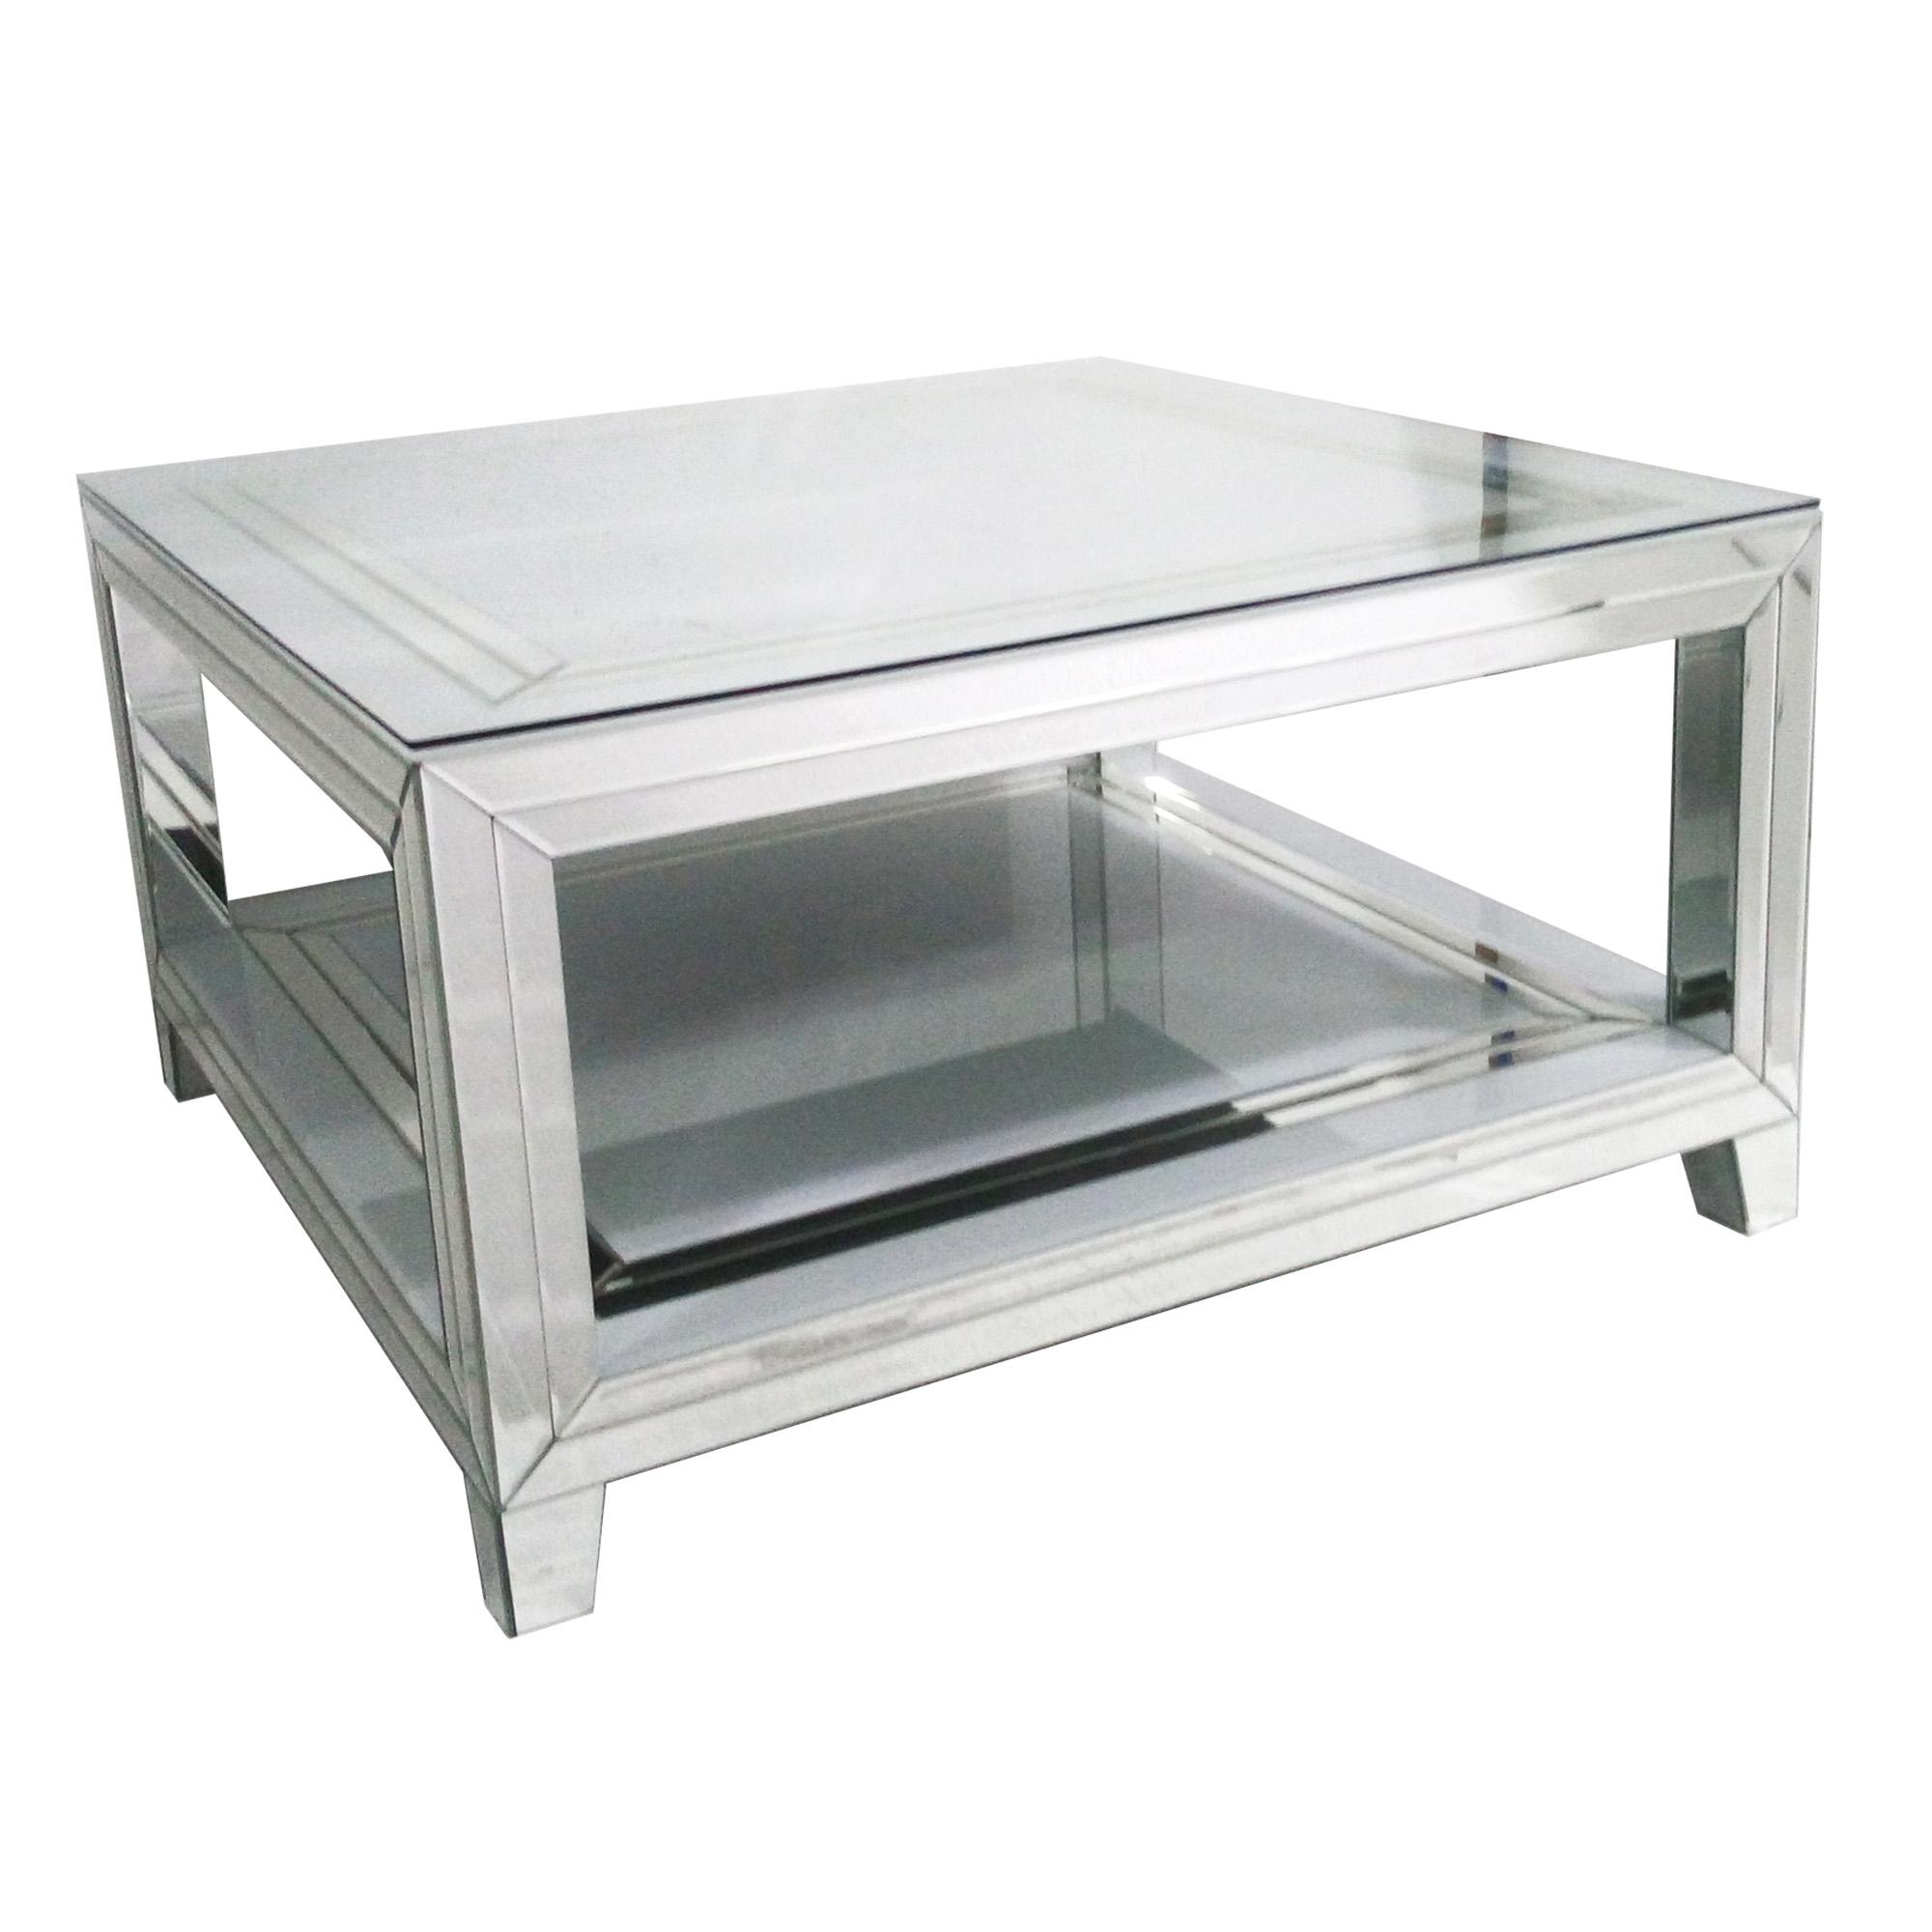 - Bianco Mirrored Square Coffee Table Mirrored Furniture